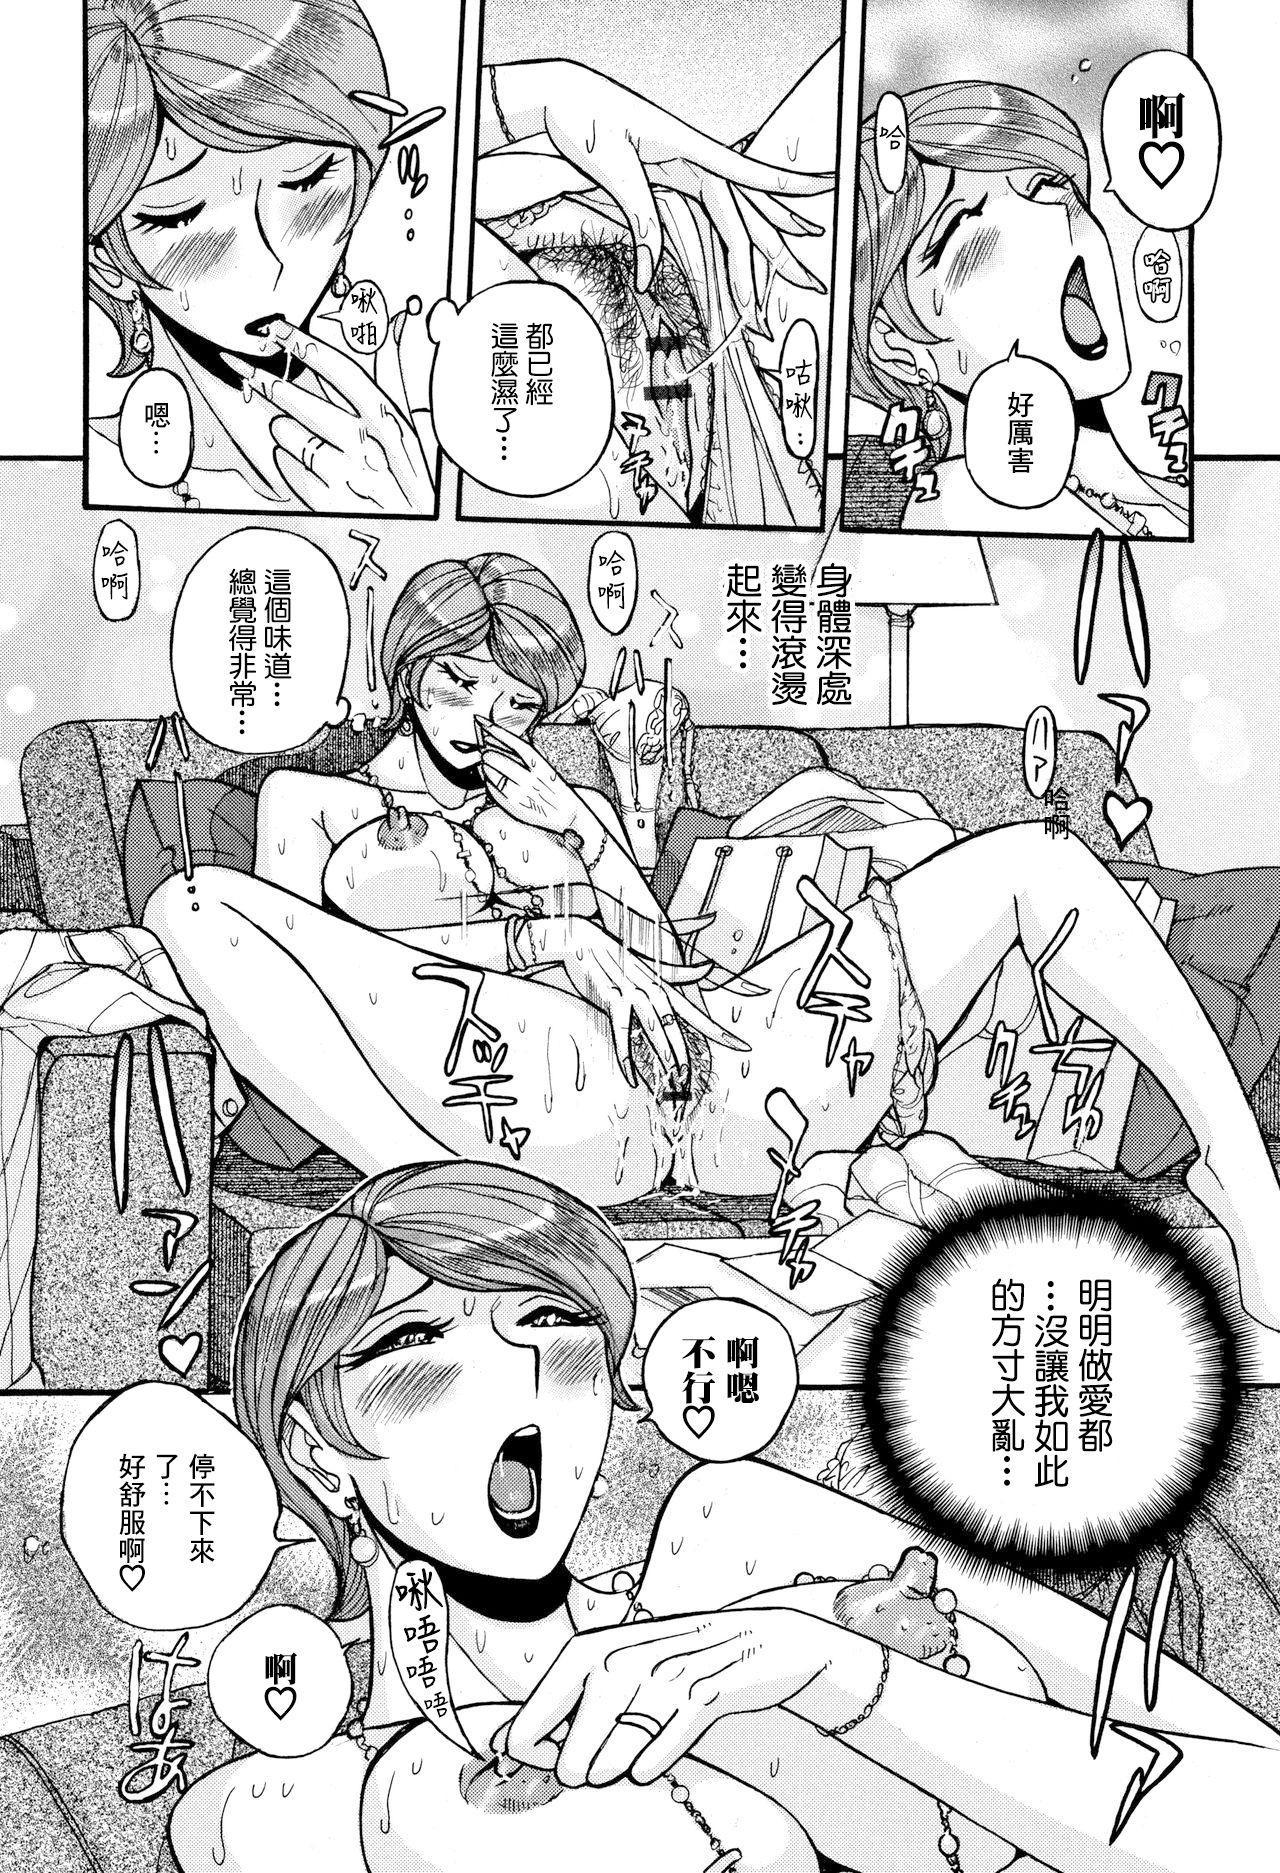 Hitozuma Hishuu Perfume Somurie | 人妻秘臭 香水·調配師 7